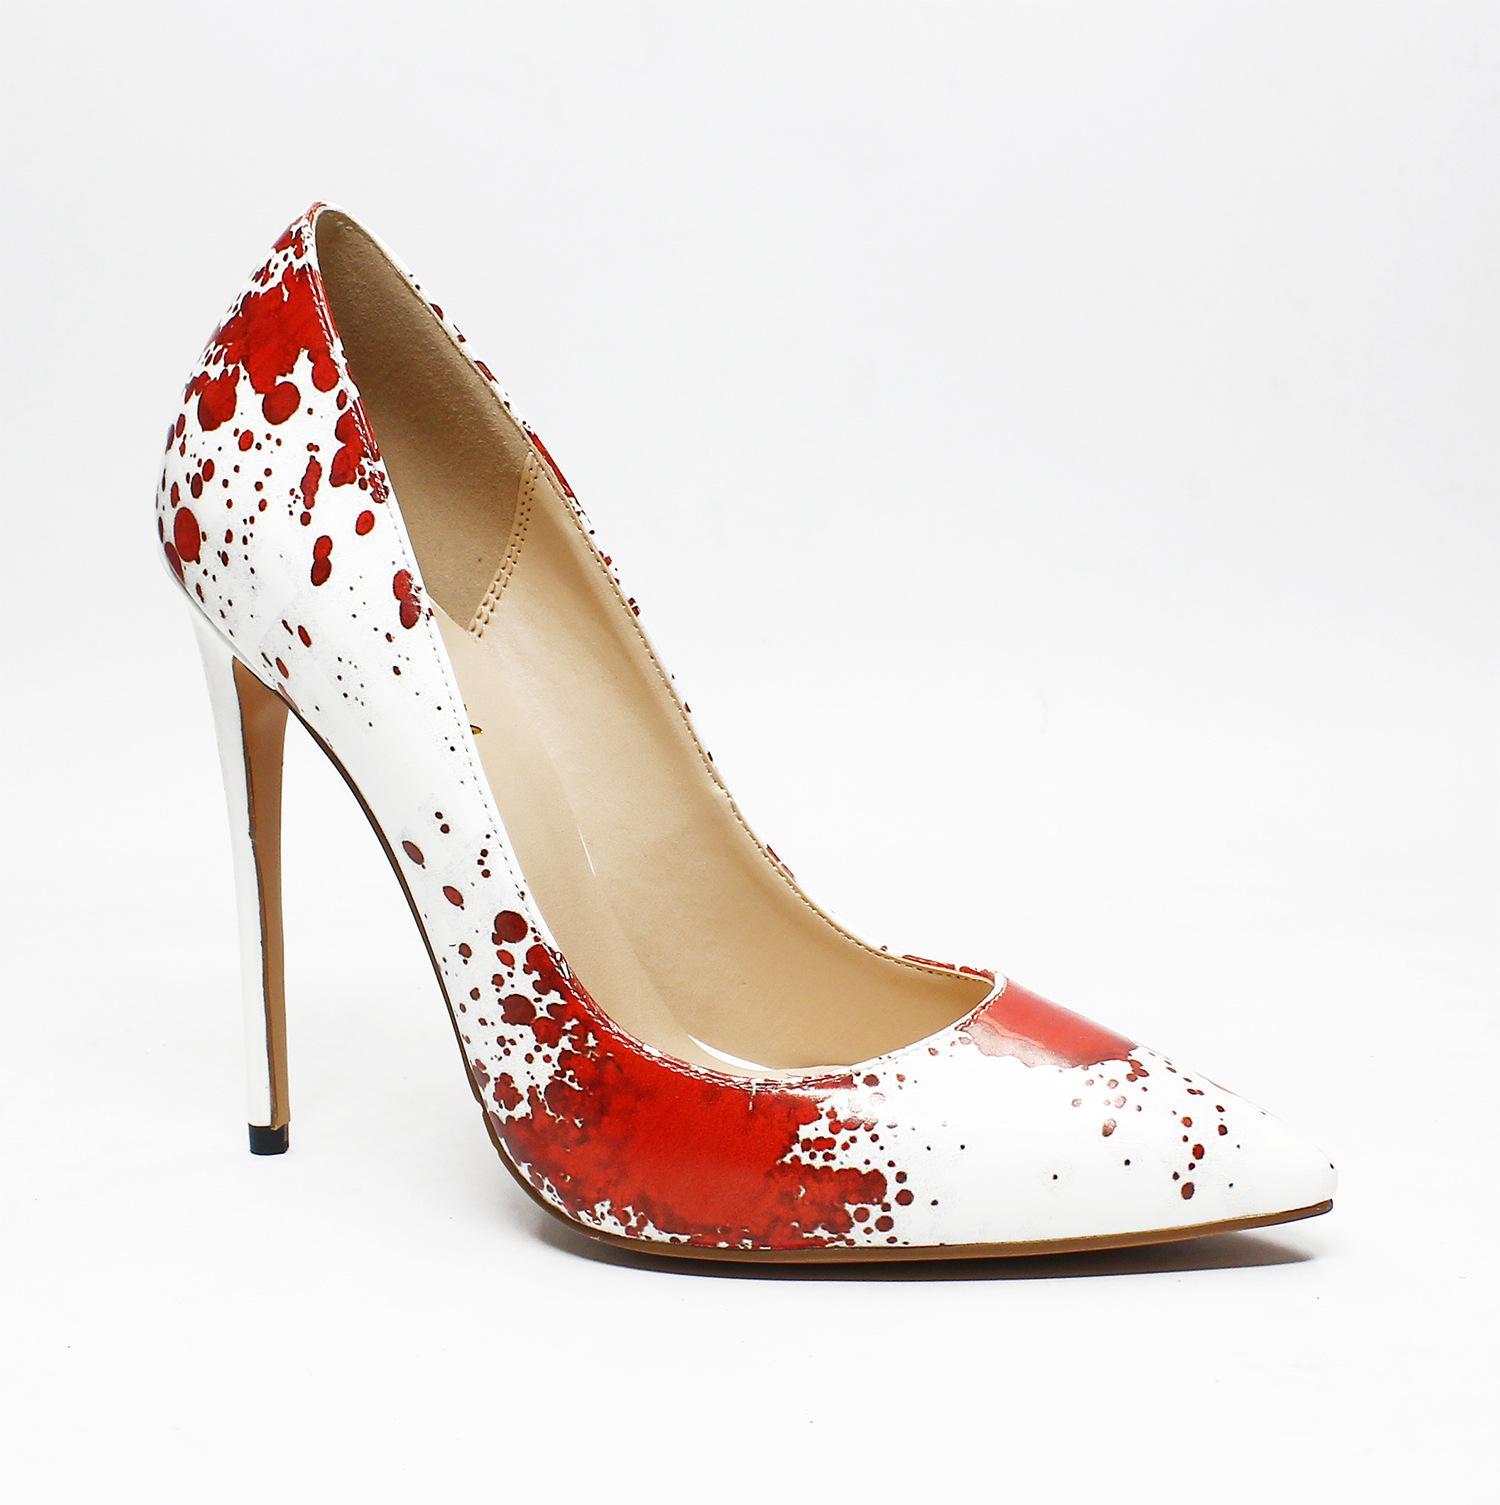 a0b10b109a9 Luxury Designer Fashion Print High Heels Pumps Red Sole Sexy Pointy ...